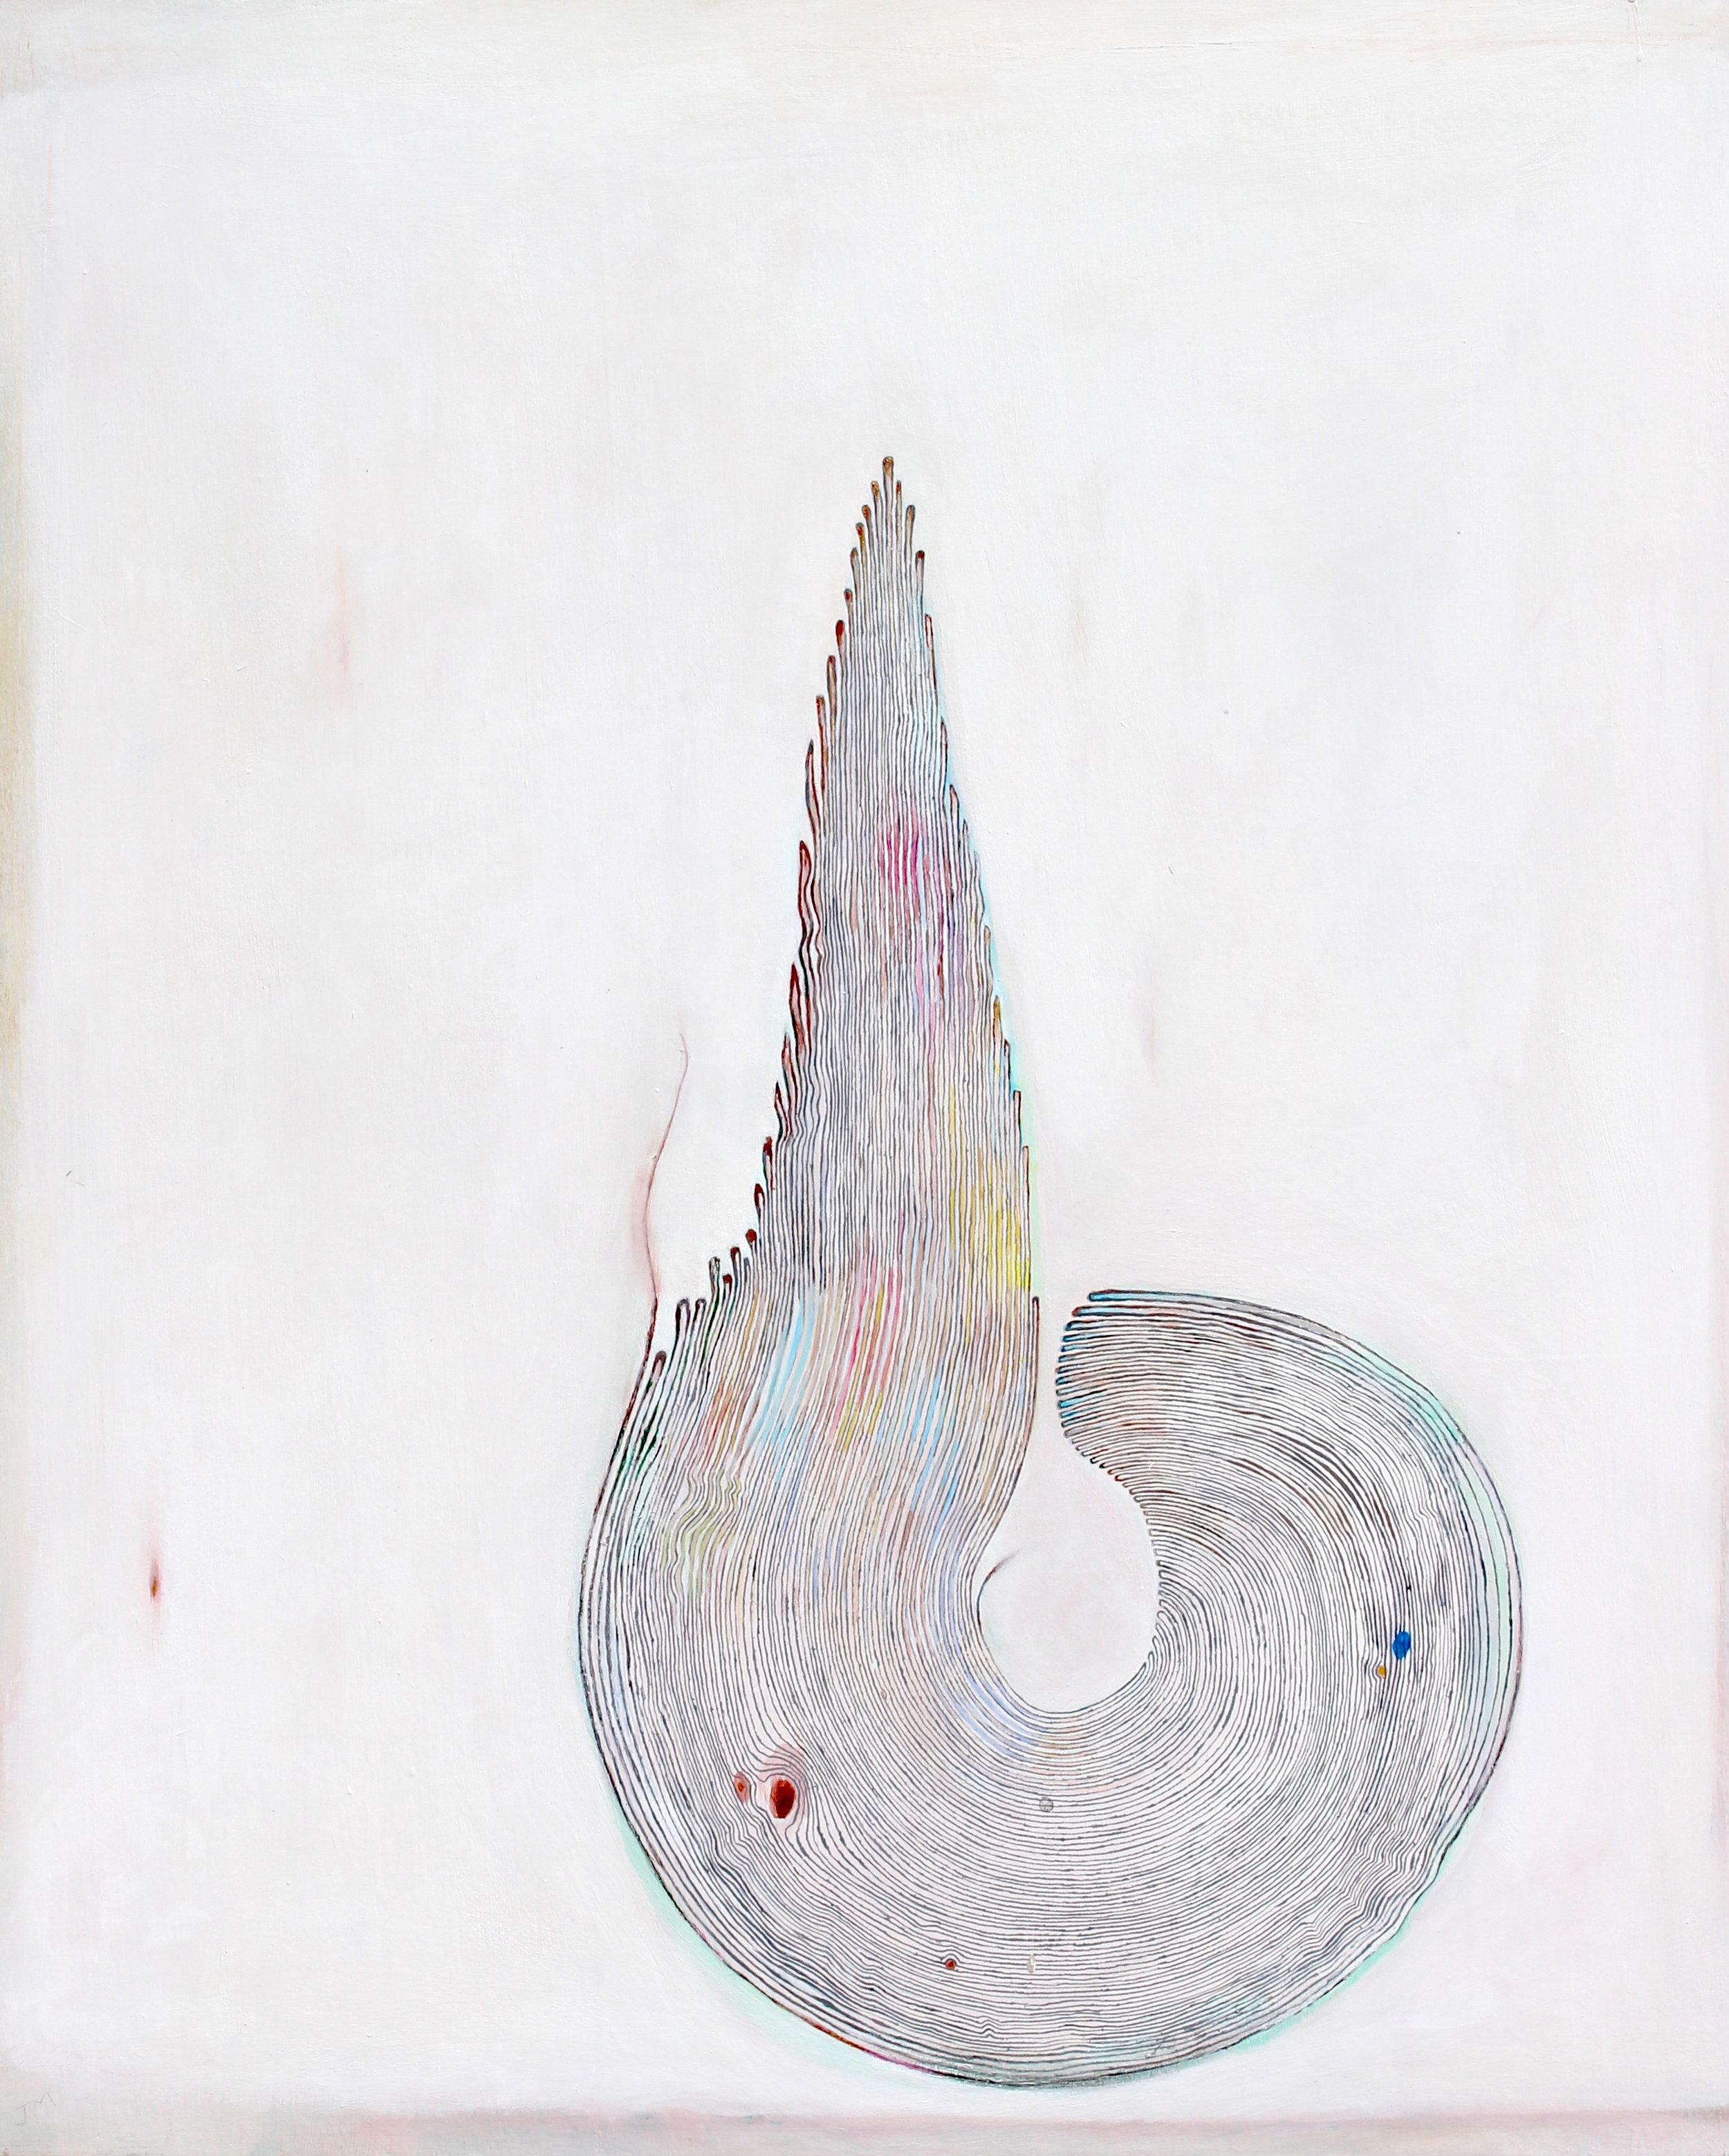 Joel Moskowitz,  Unspooled , Acrylic on wood panel, 30x24